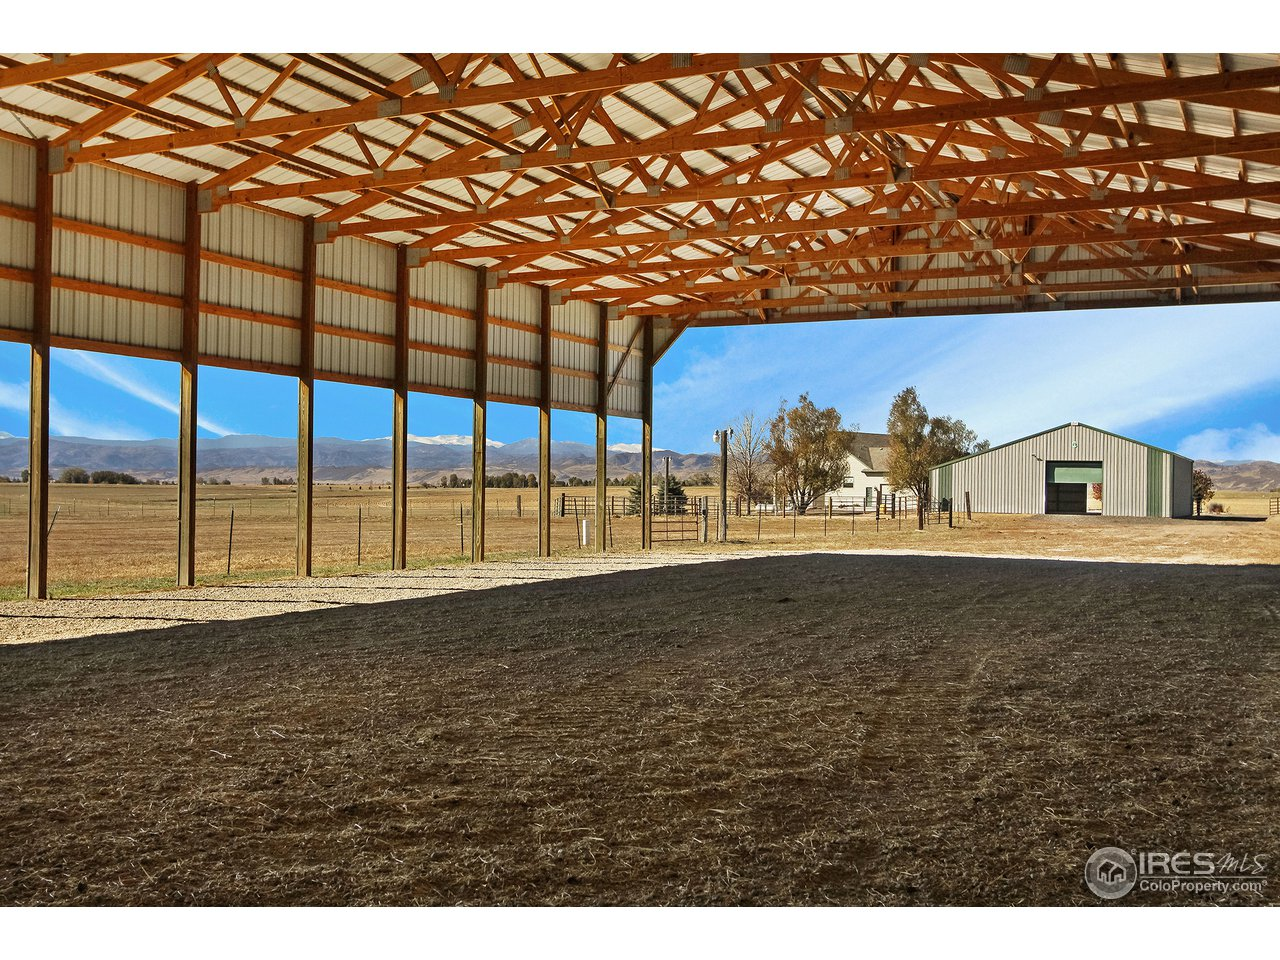 50'x96' Hay Barn